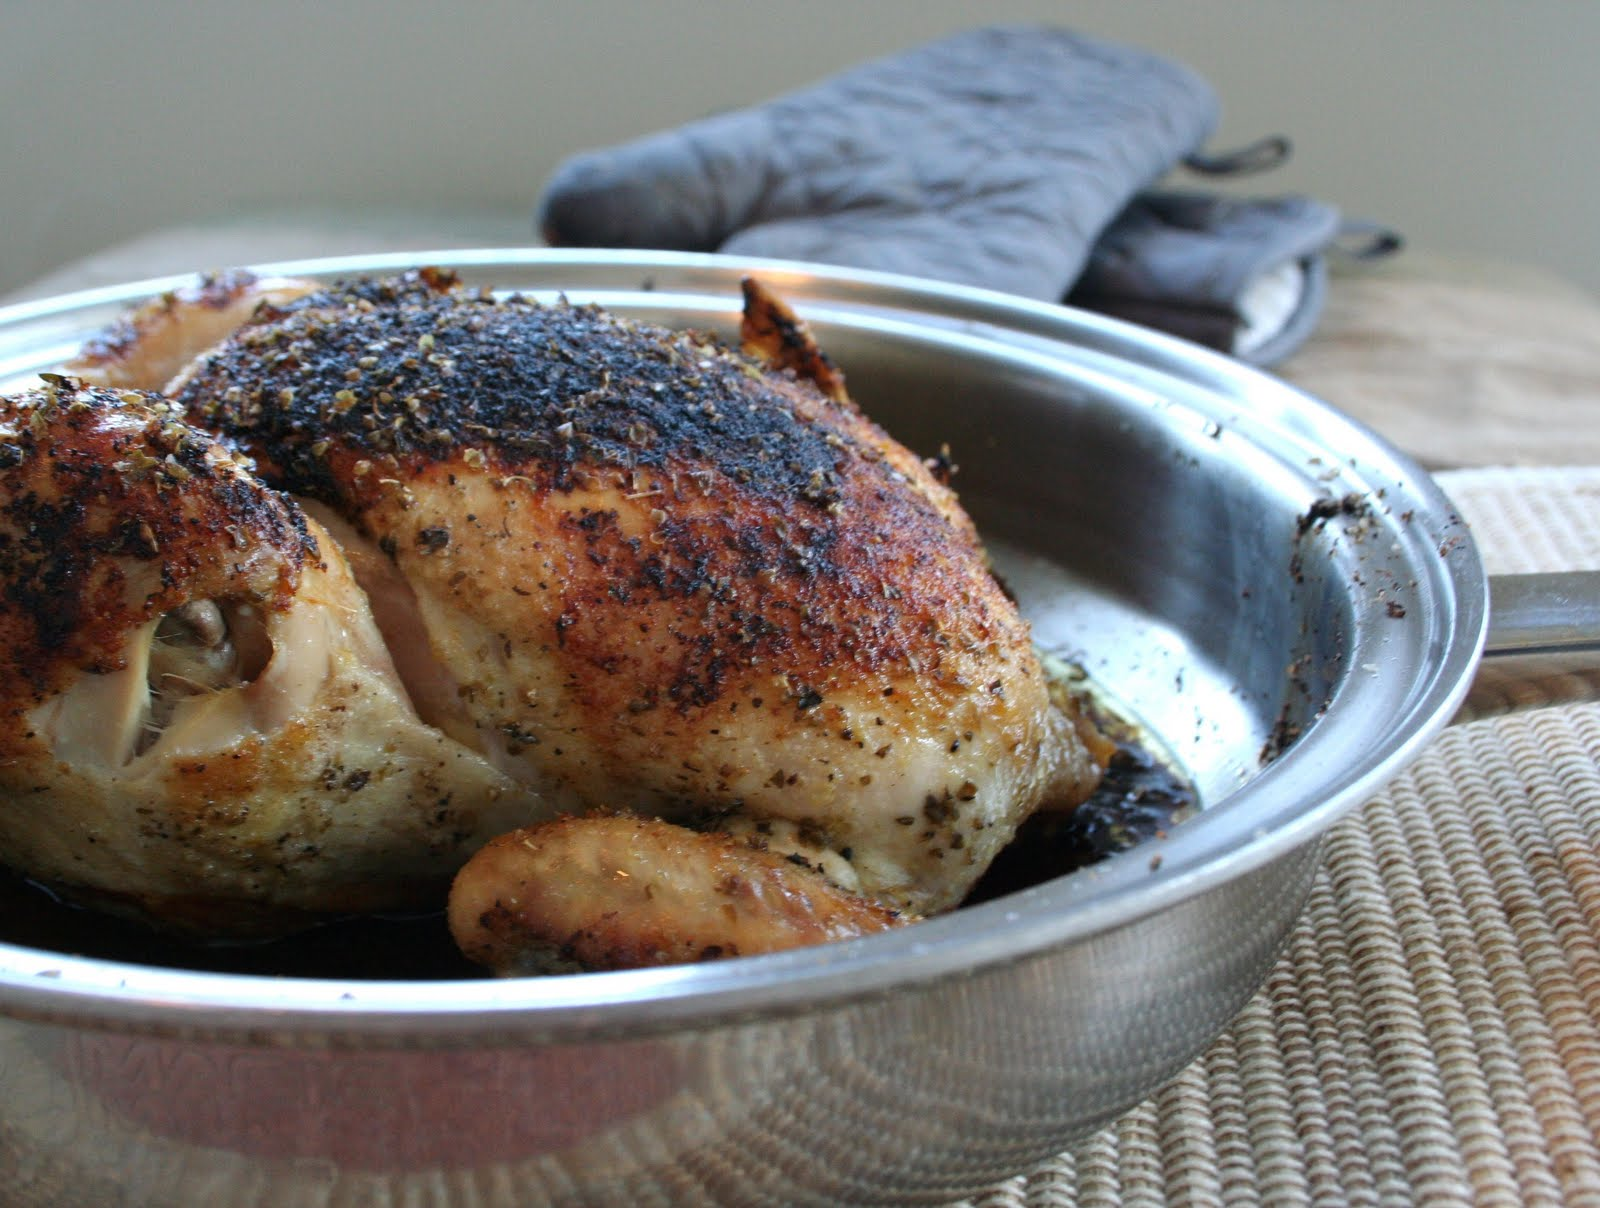 Meal Planning 101: Simple Lemon Oregano Roasted Chicken